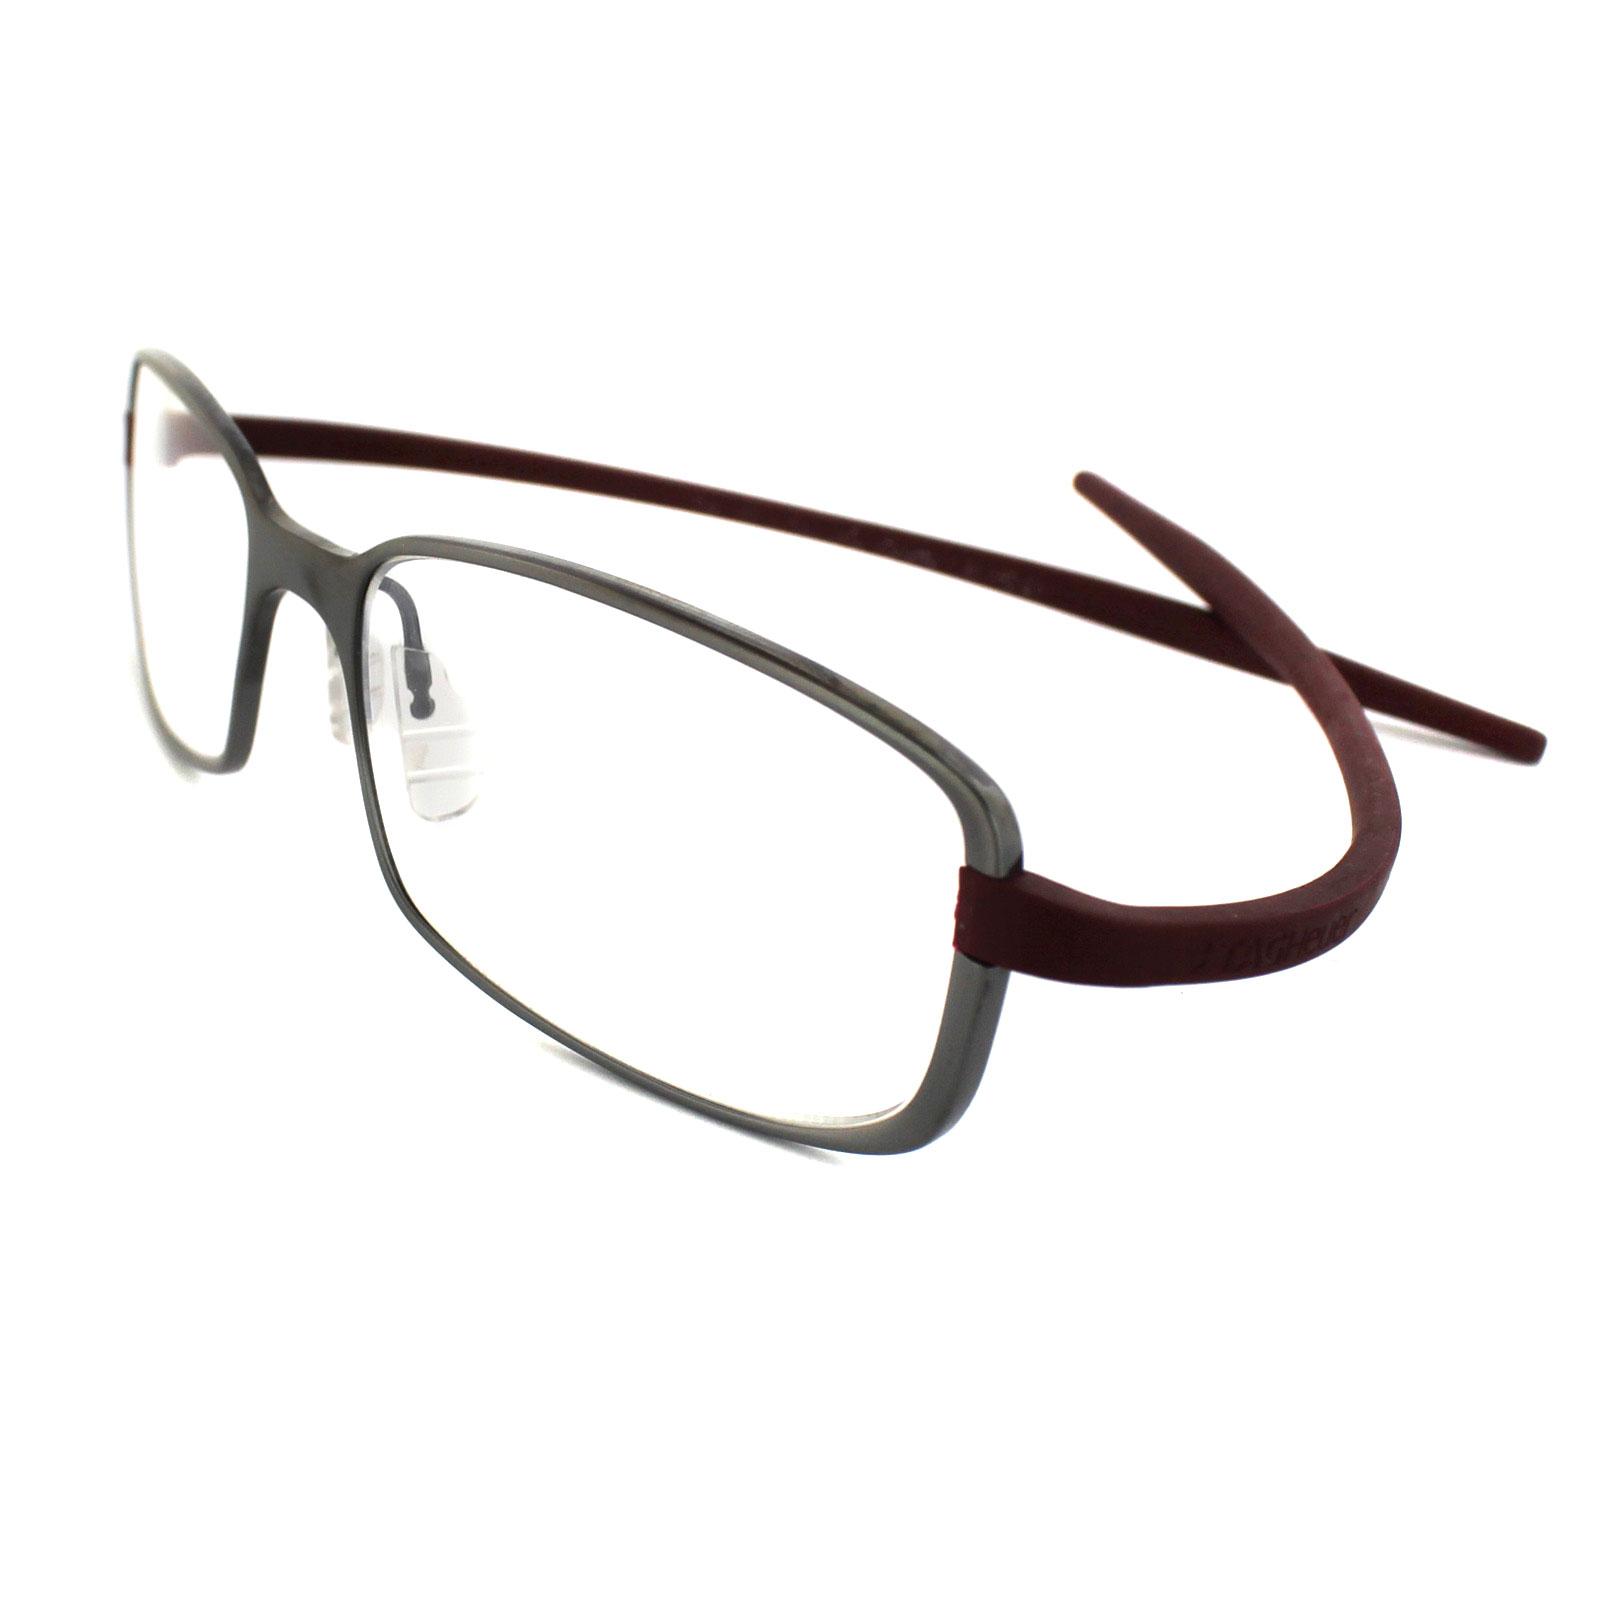 Tag heuer eyeglasses frames uk - Sentinel Tag Heuer Glasses 3706 018 Ceramic Titanium Silver Frames Bordeaux Rubber Arms